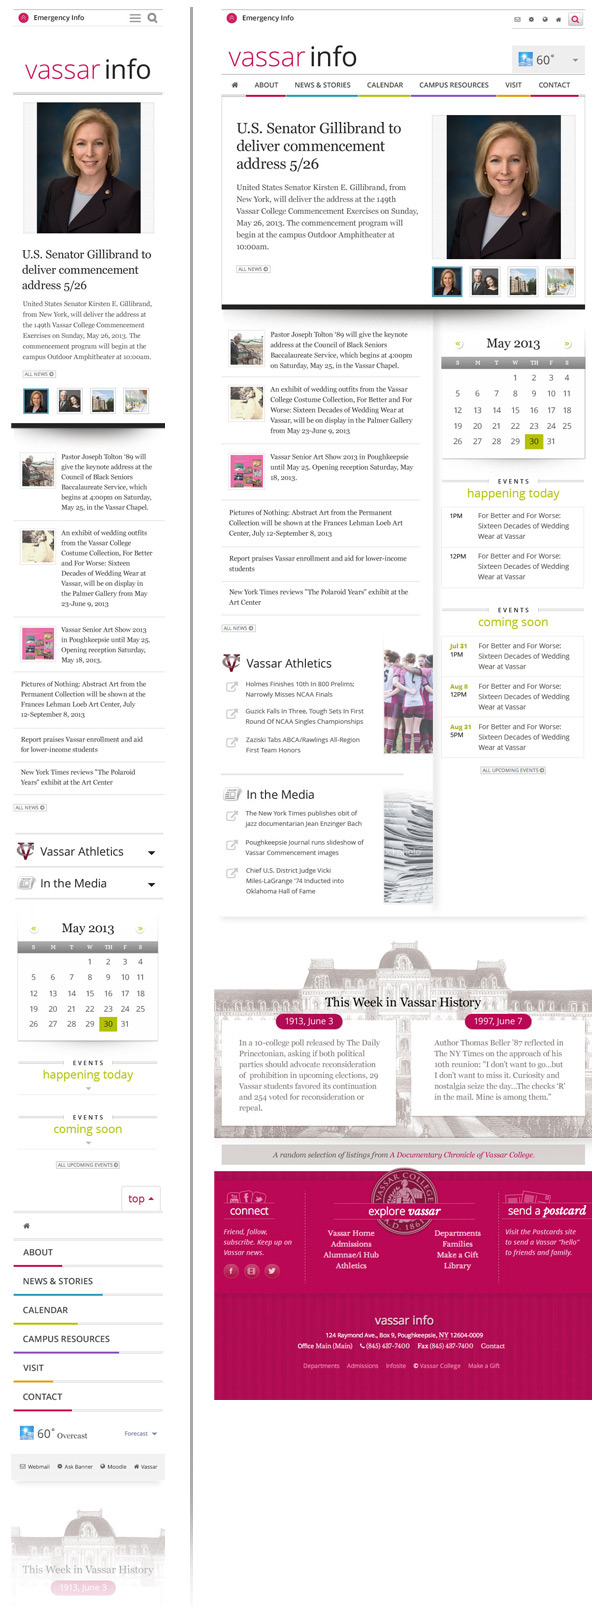 vassar college newspaper information calendar drop-down navigation clean mobile Responsive Design